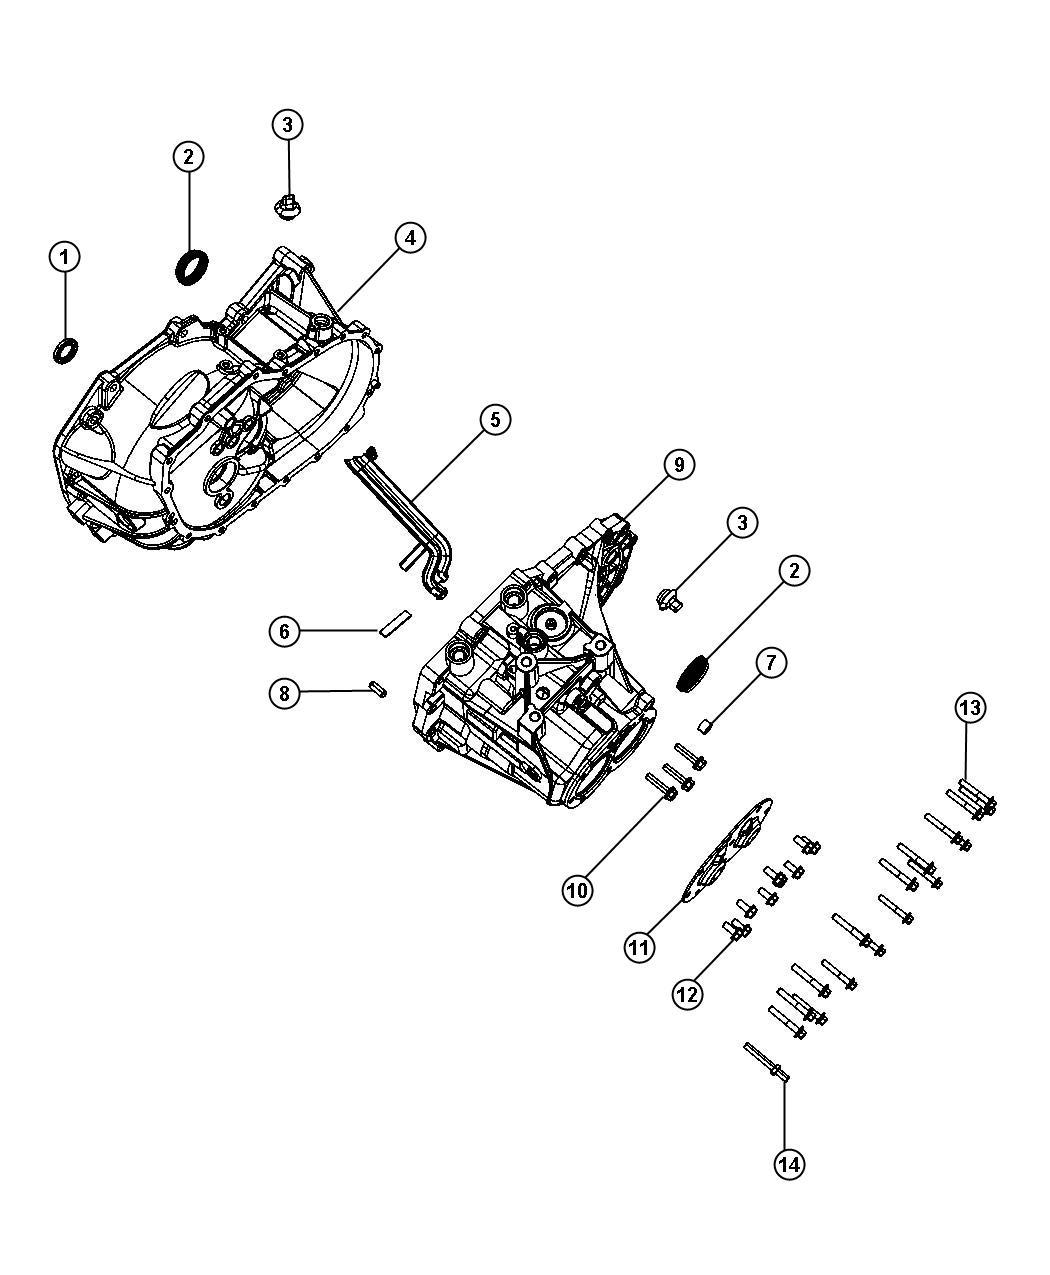 2011 Jeep Compass Case. Transmission. Power, train, module